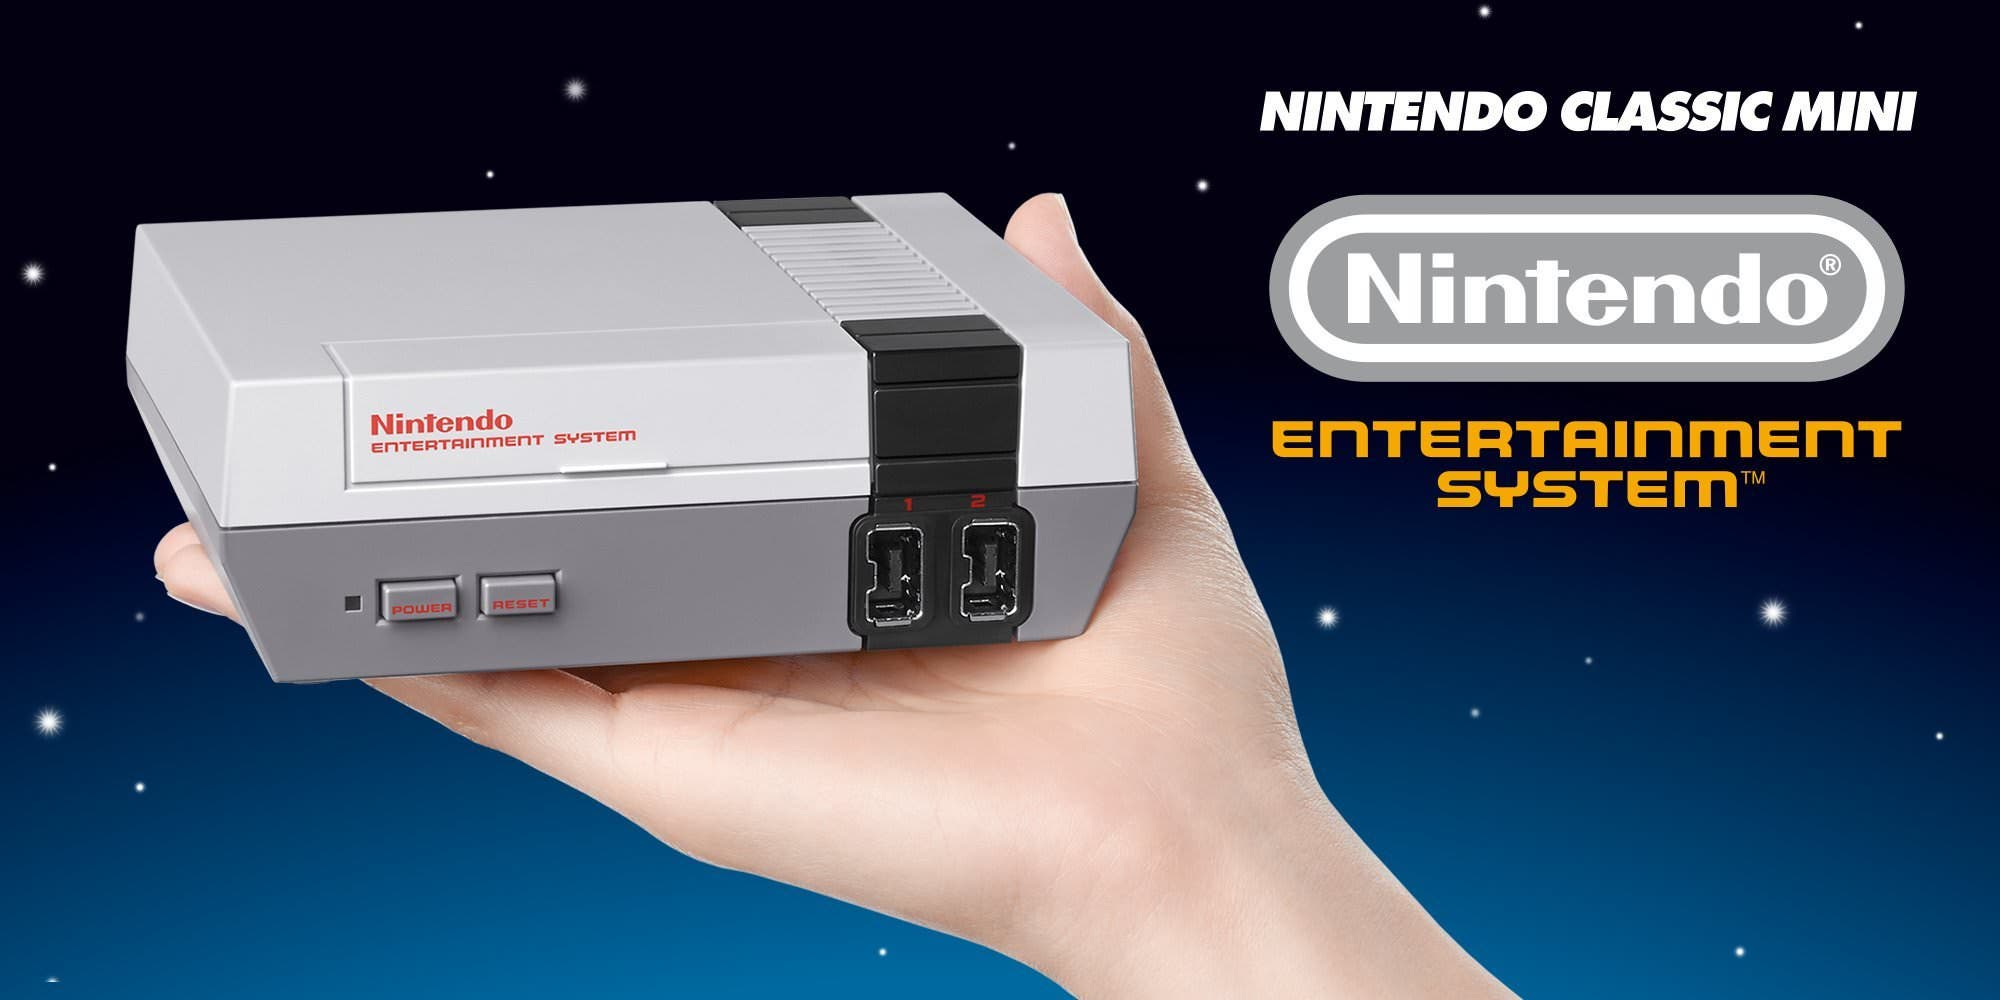 Unboxing europeo de Nintendo Classic Mini: NES